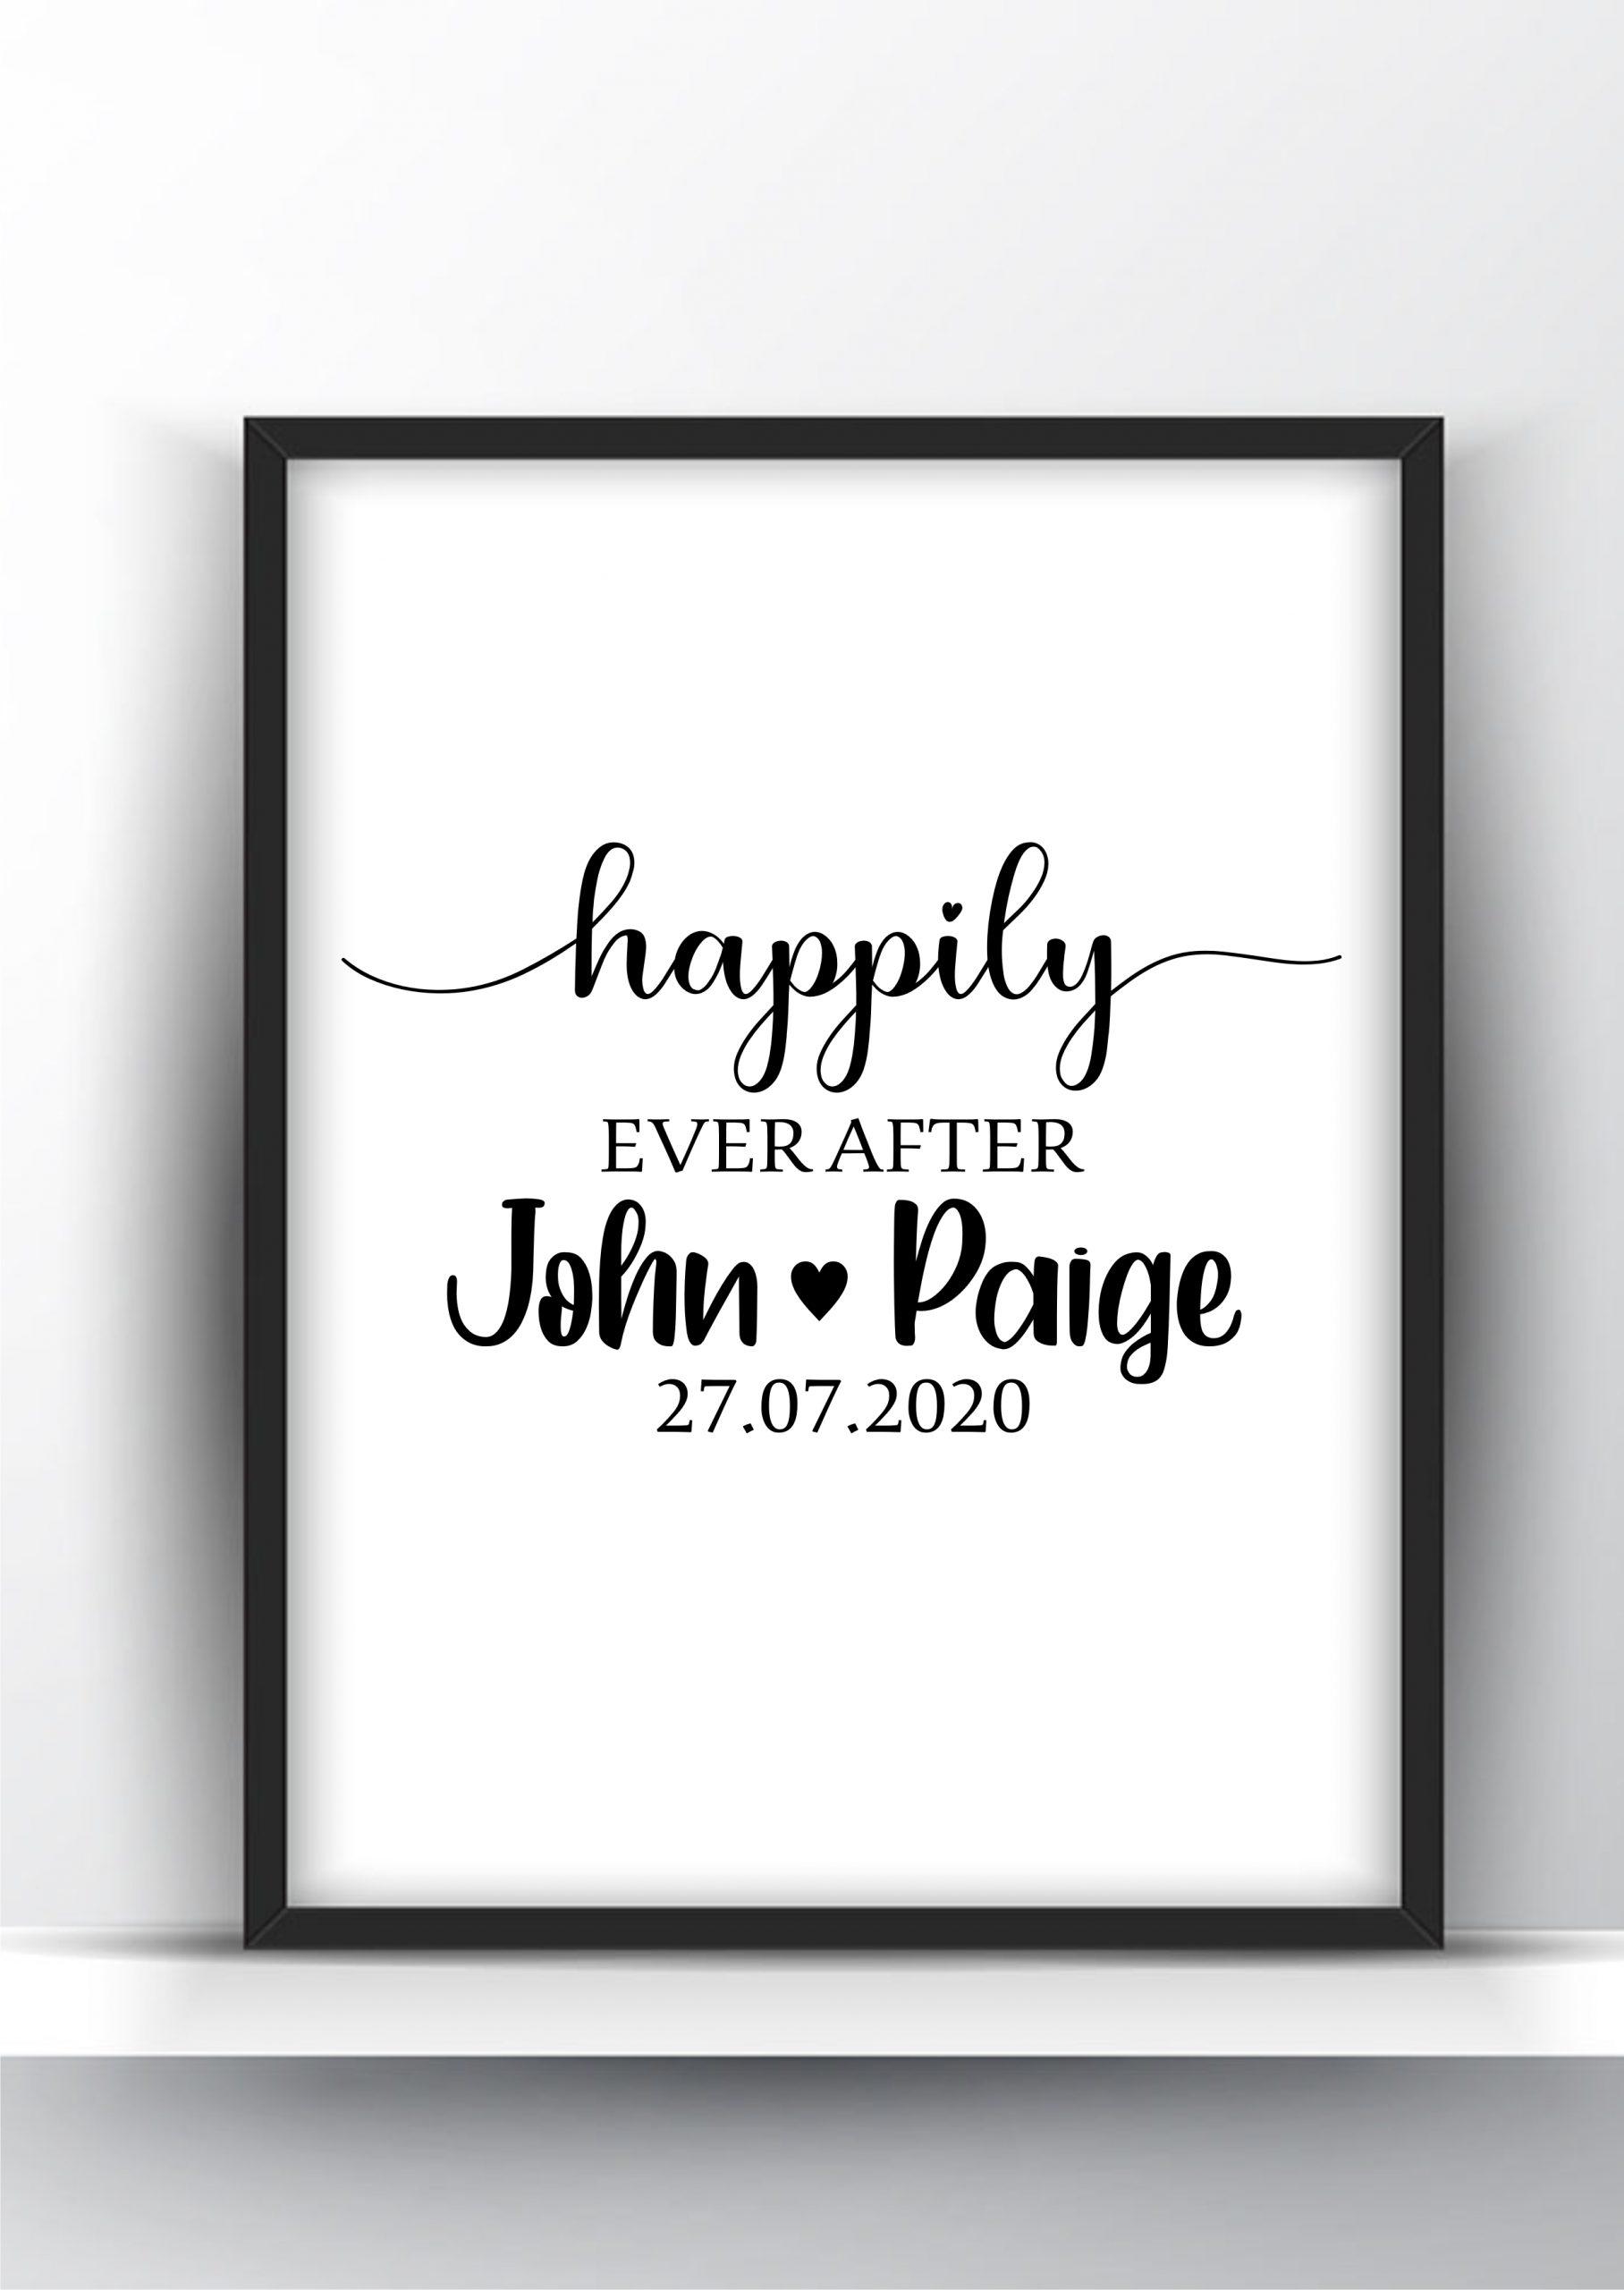 Happily Ever After Custom Gift For Newlyweds Printable Wall Art Shark Printables